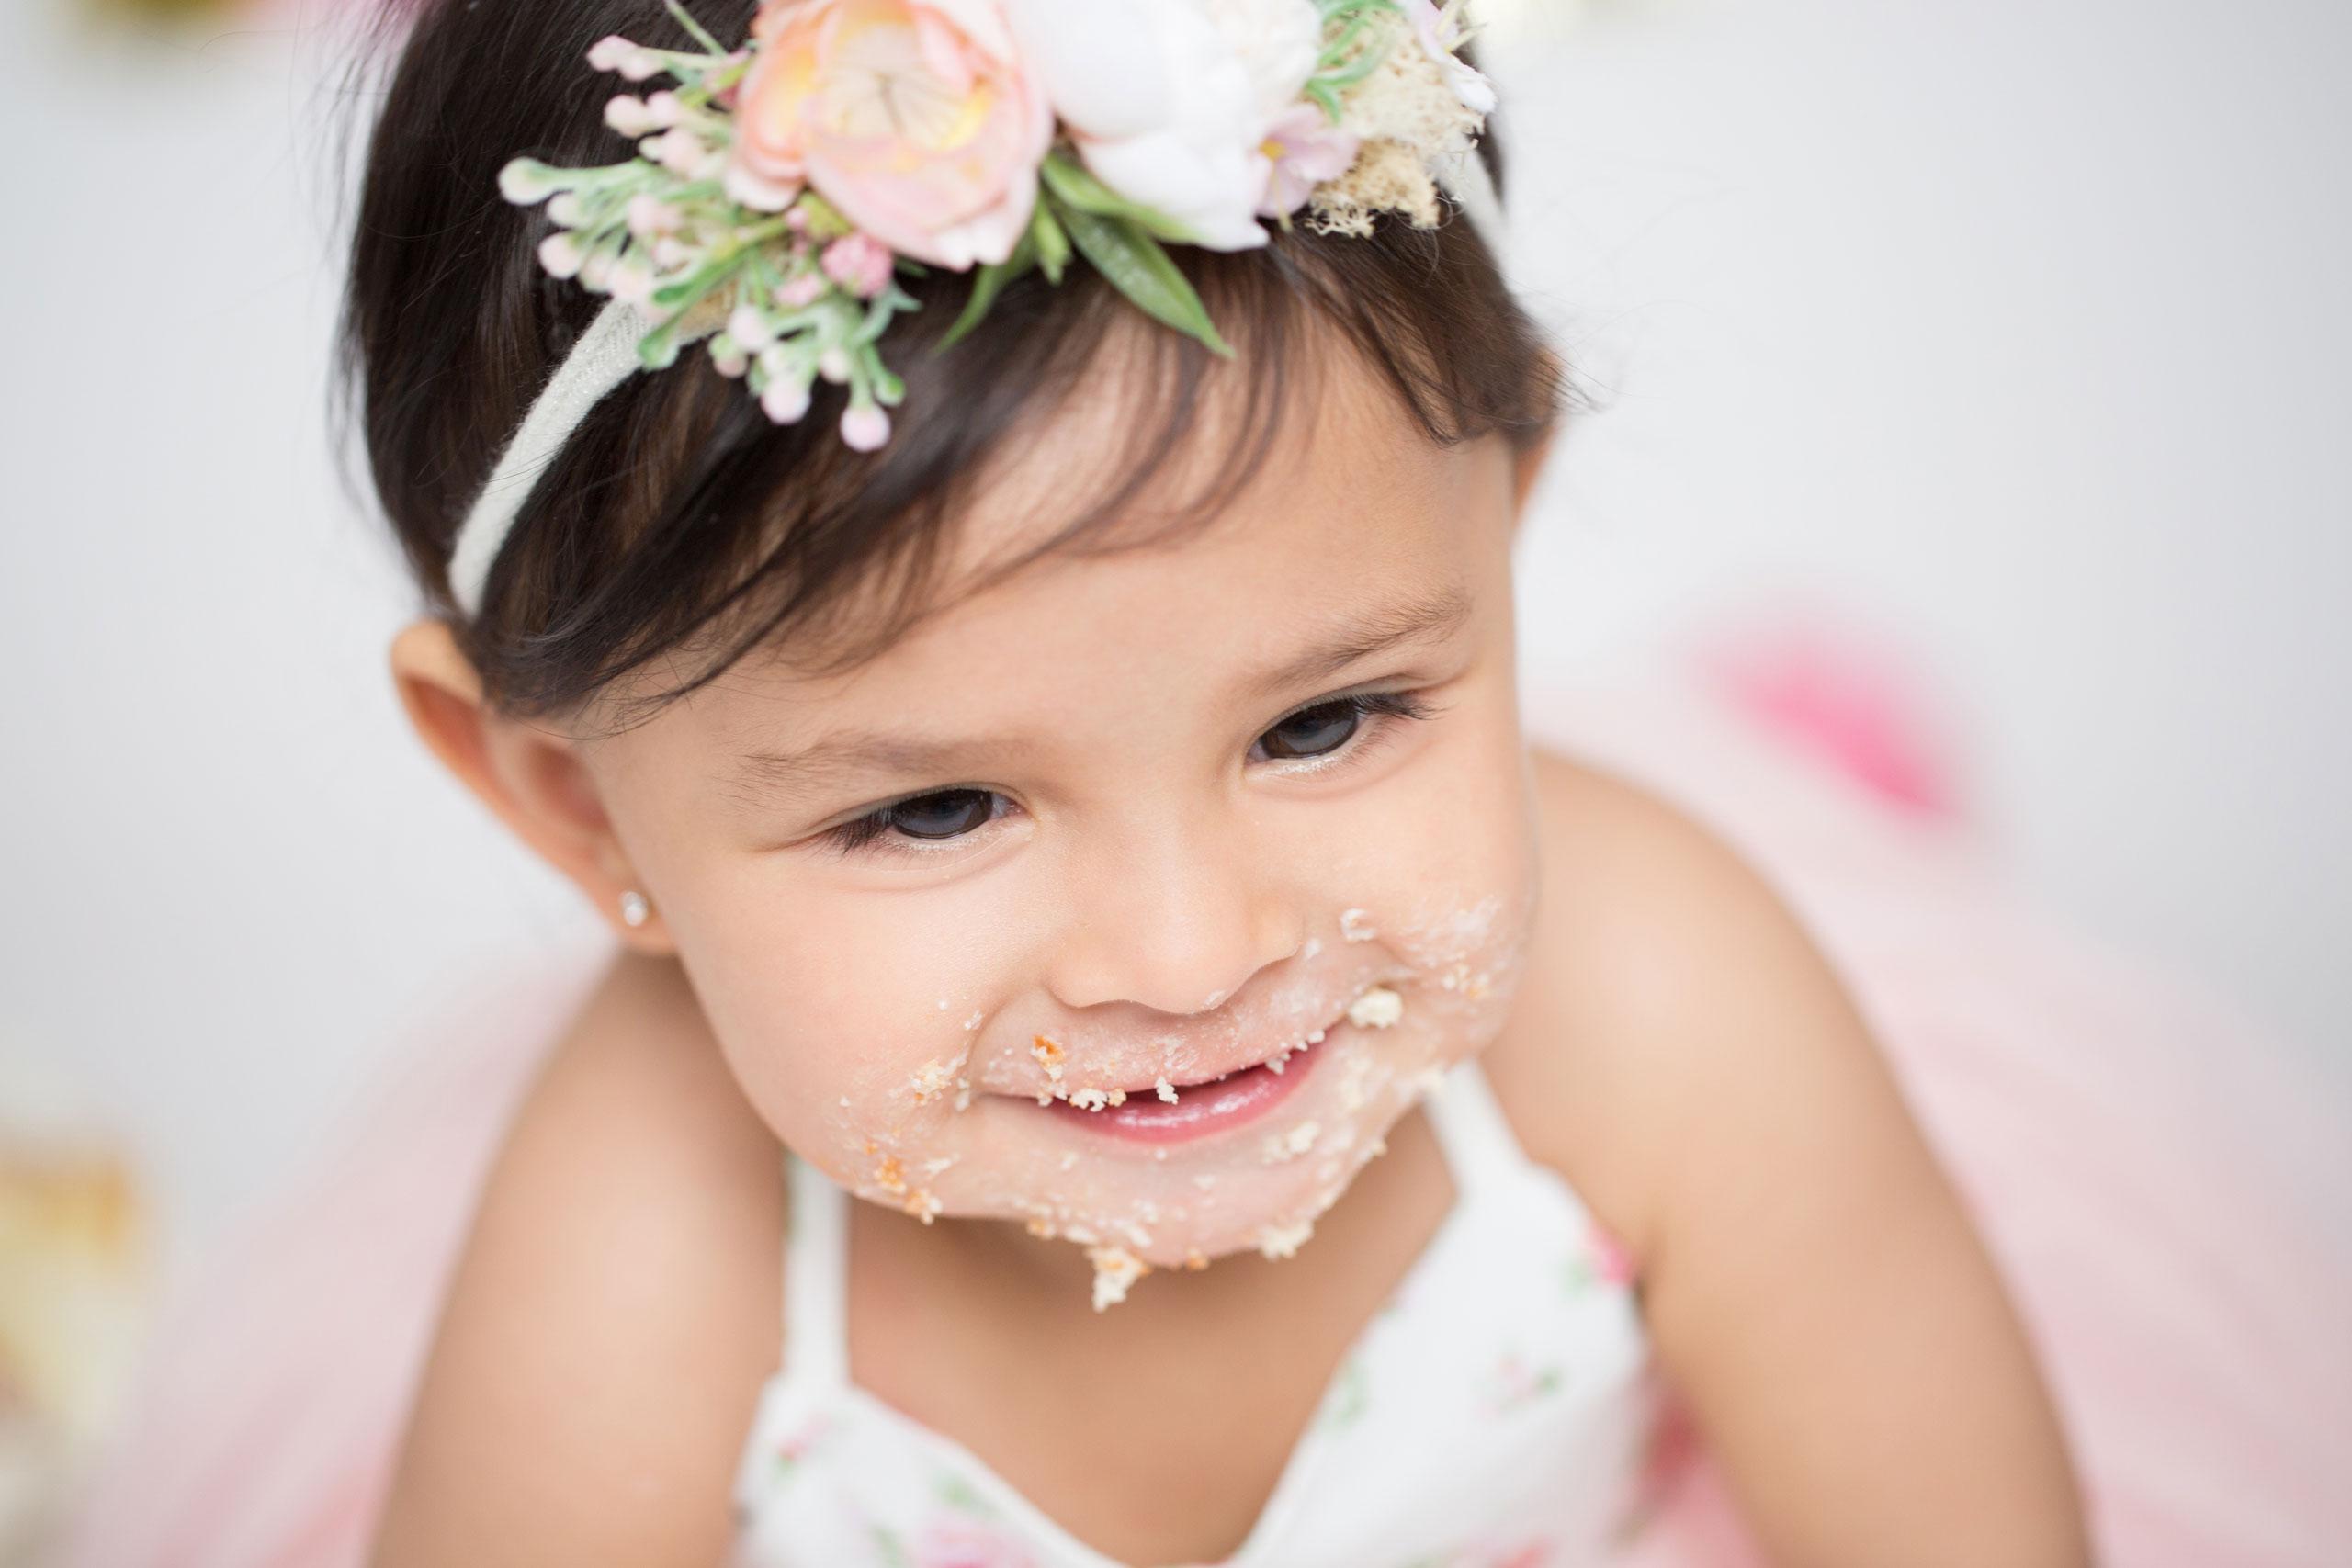 ramina magid baby cake smash first birthday photography los angeles